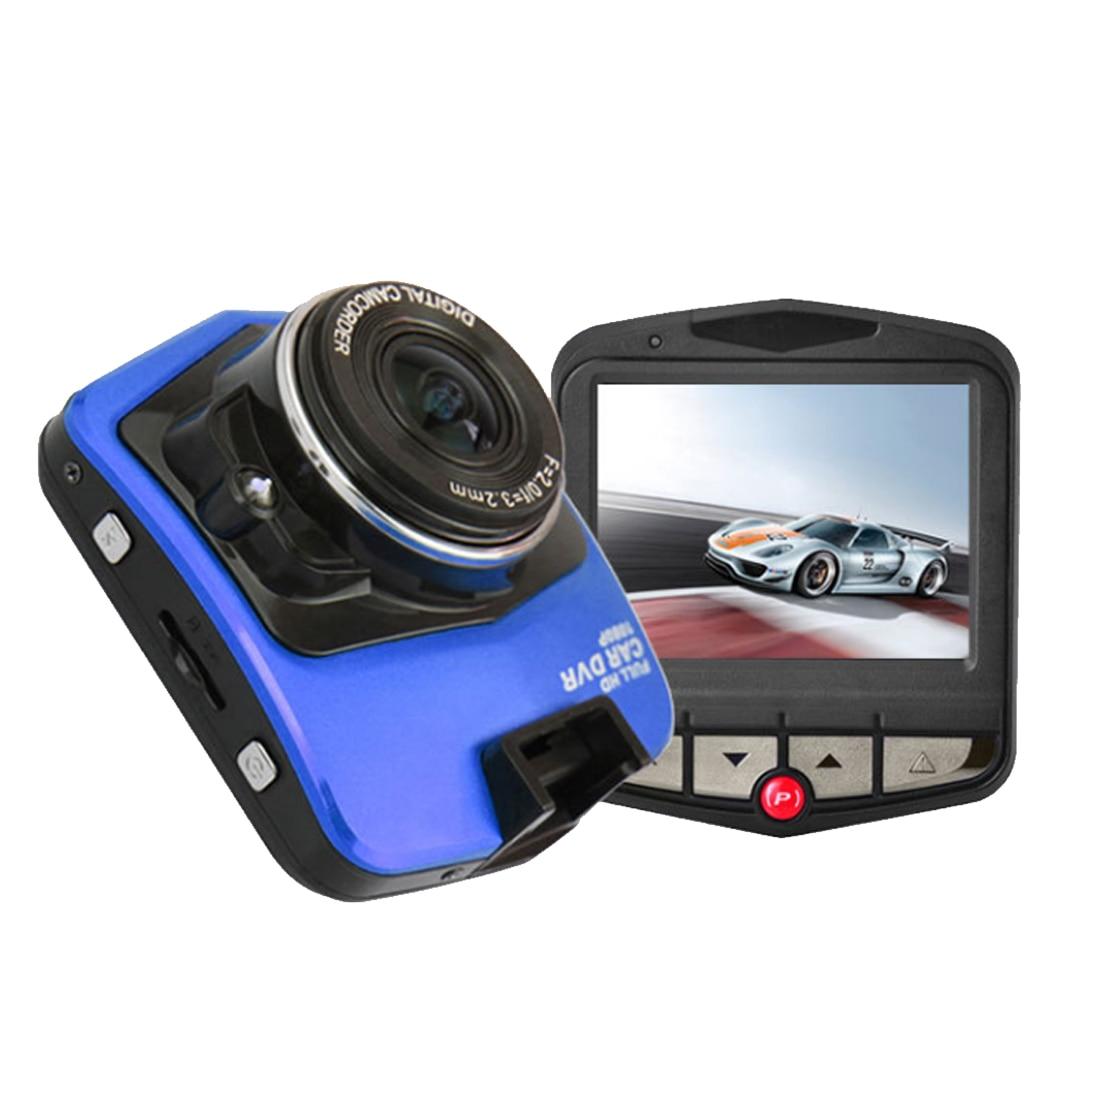 Dewtreetali SALE2.4 Inch LCD Screen Driving Recorder Car DVR Night Vision Mini Camcorders Camera Video Dash Cam Dashcam Vehicle